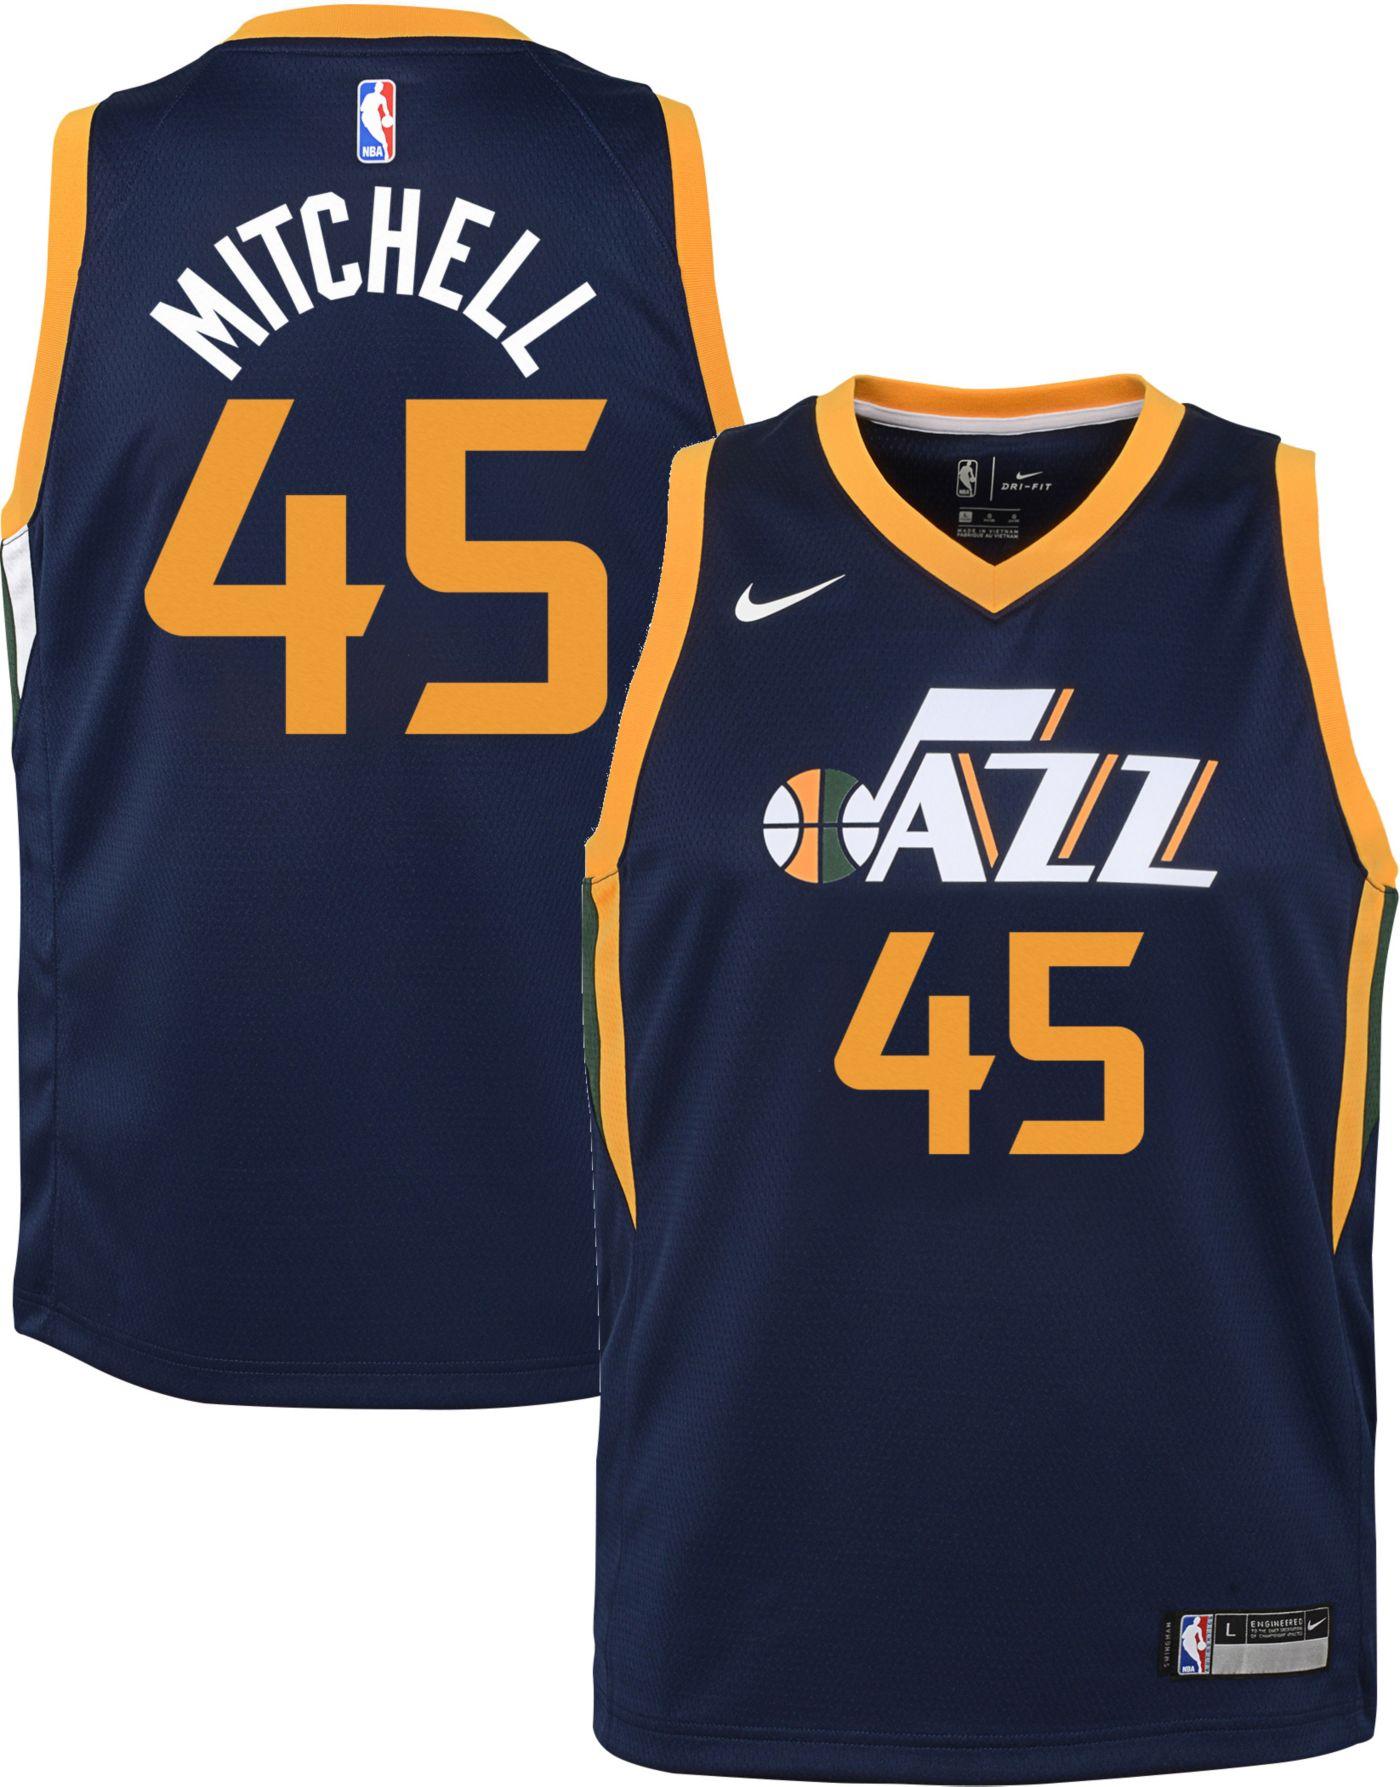 Nike Youth Utah Jazz Donovan Mitchell #45 Navy Dri-FIT Swingman Jersey